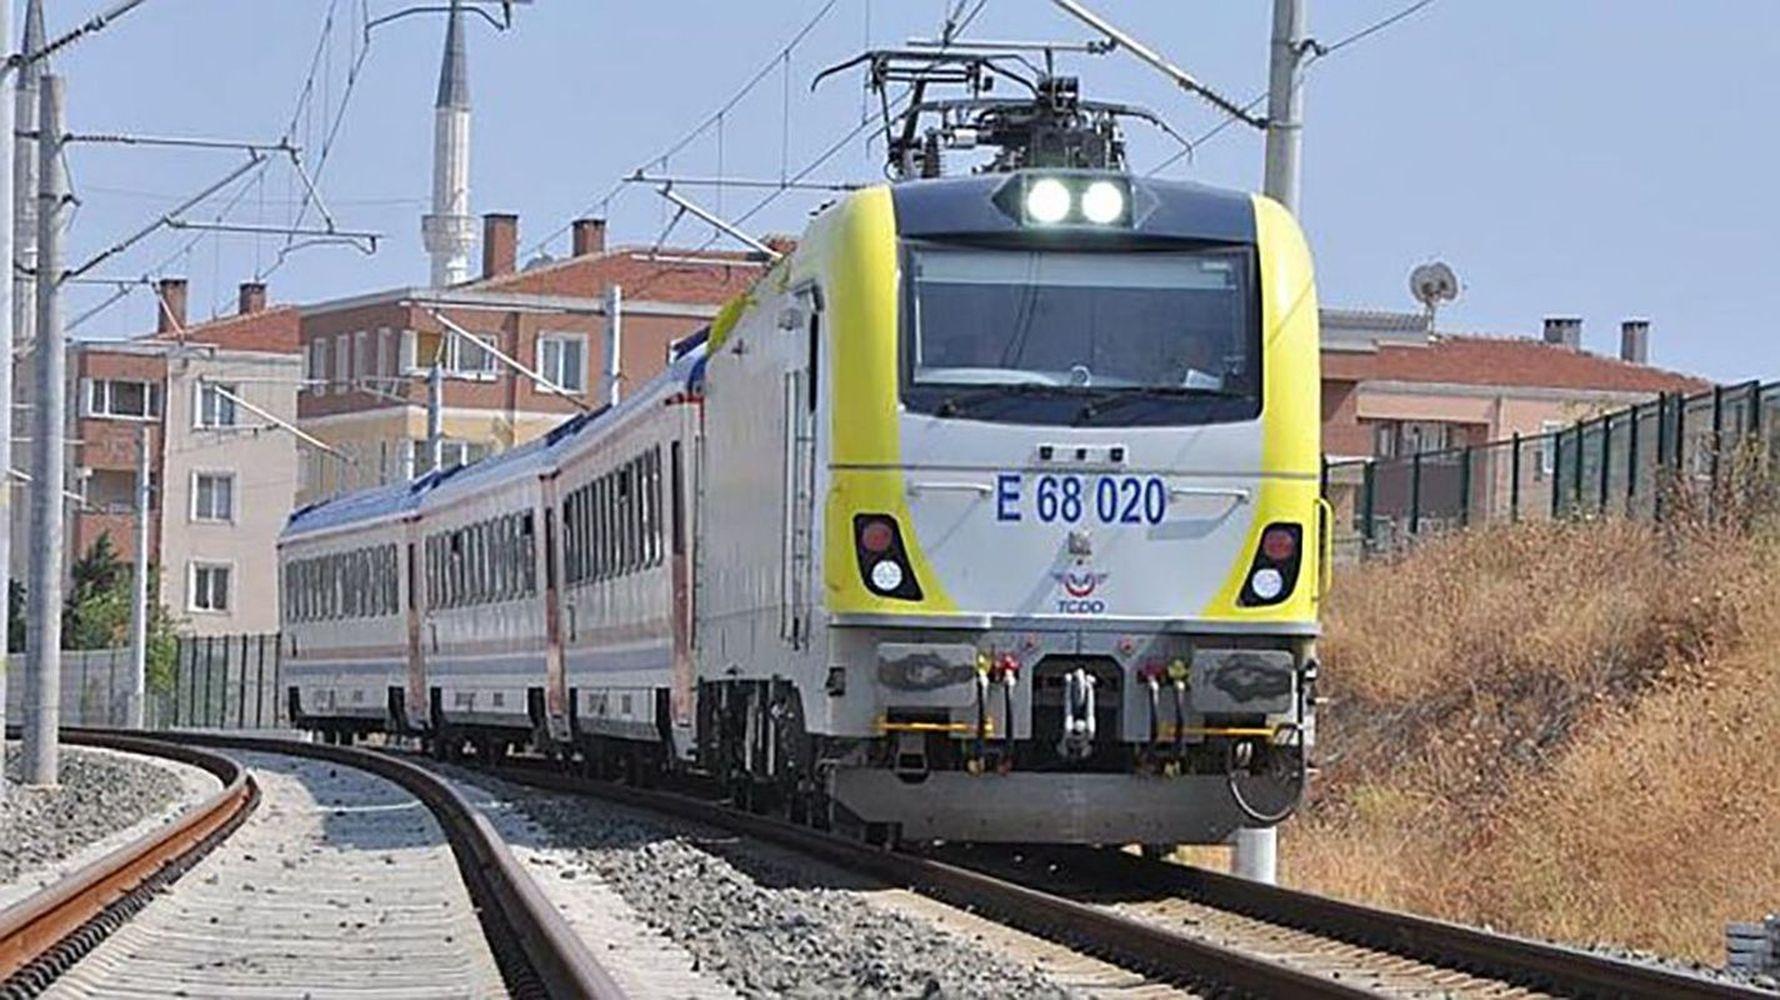 Why are there not adapazari train services?